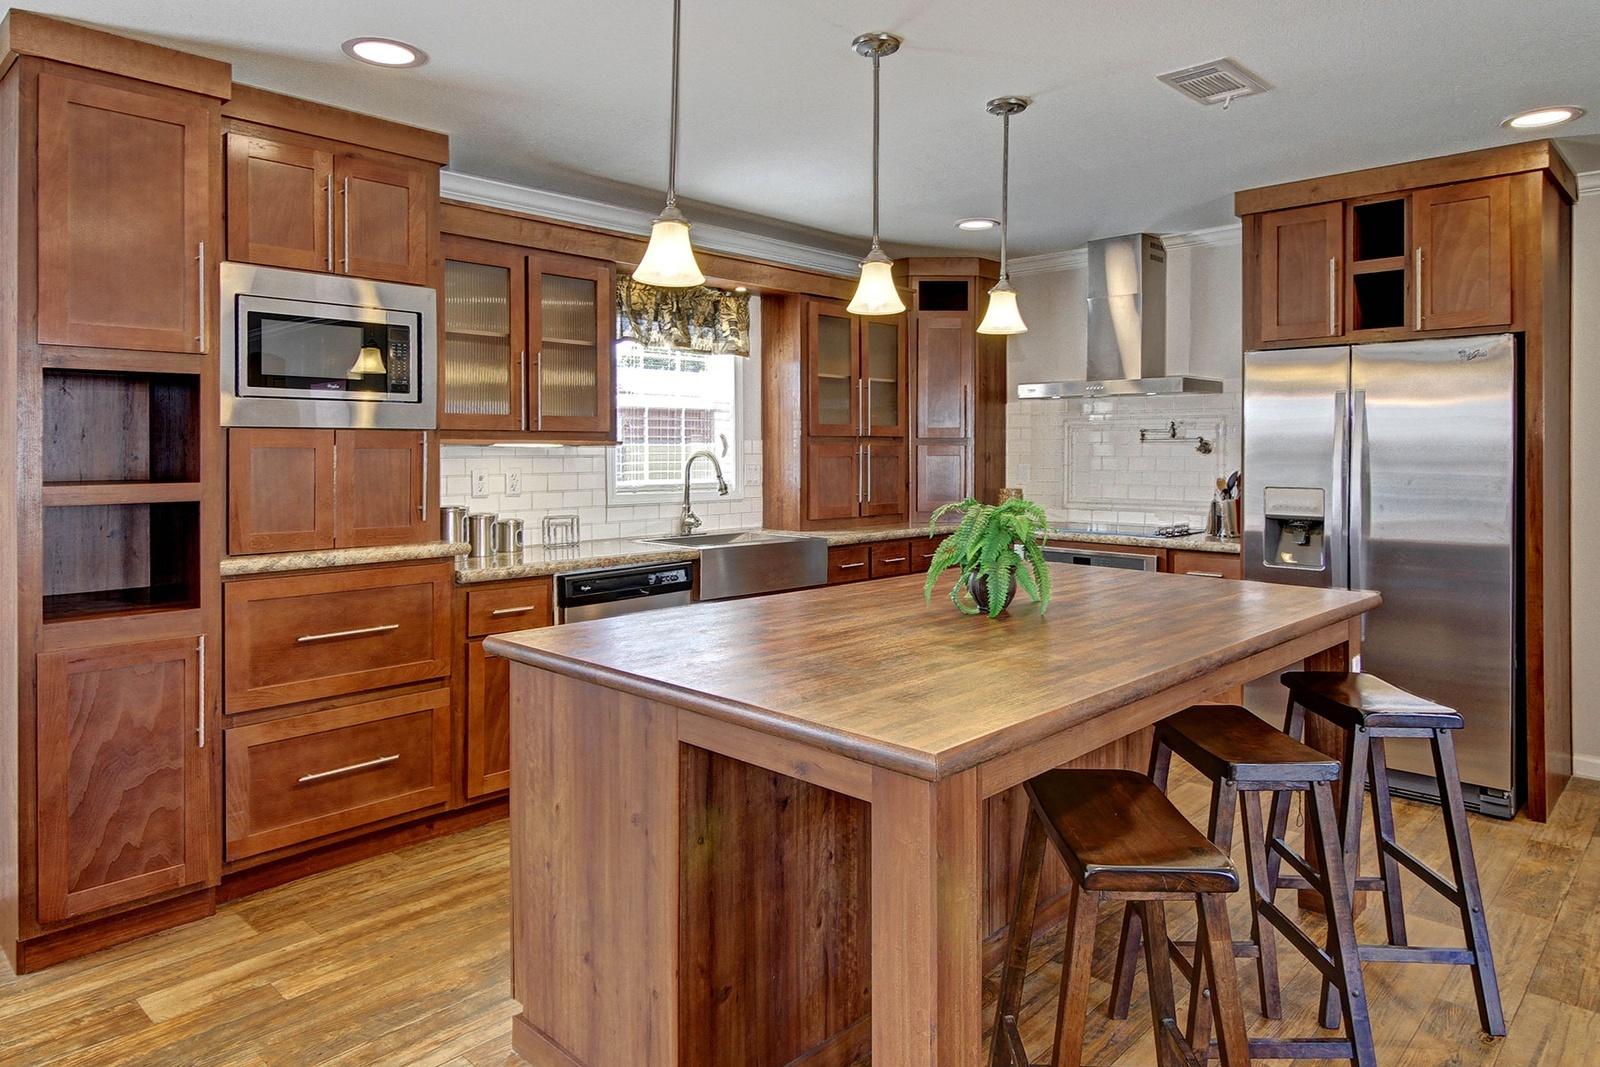 hillcrest-ultimate-kitchen2-1-1600x1067.jpg